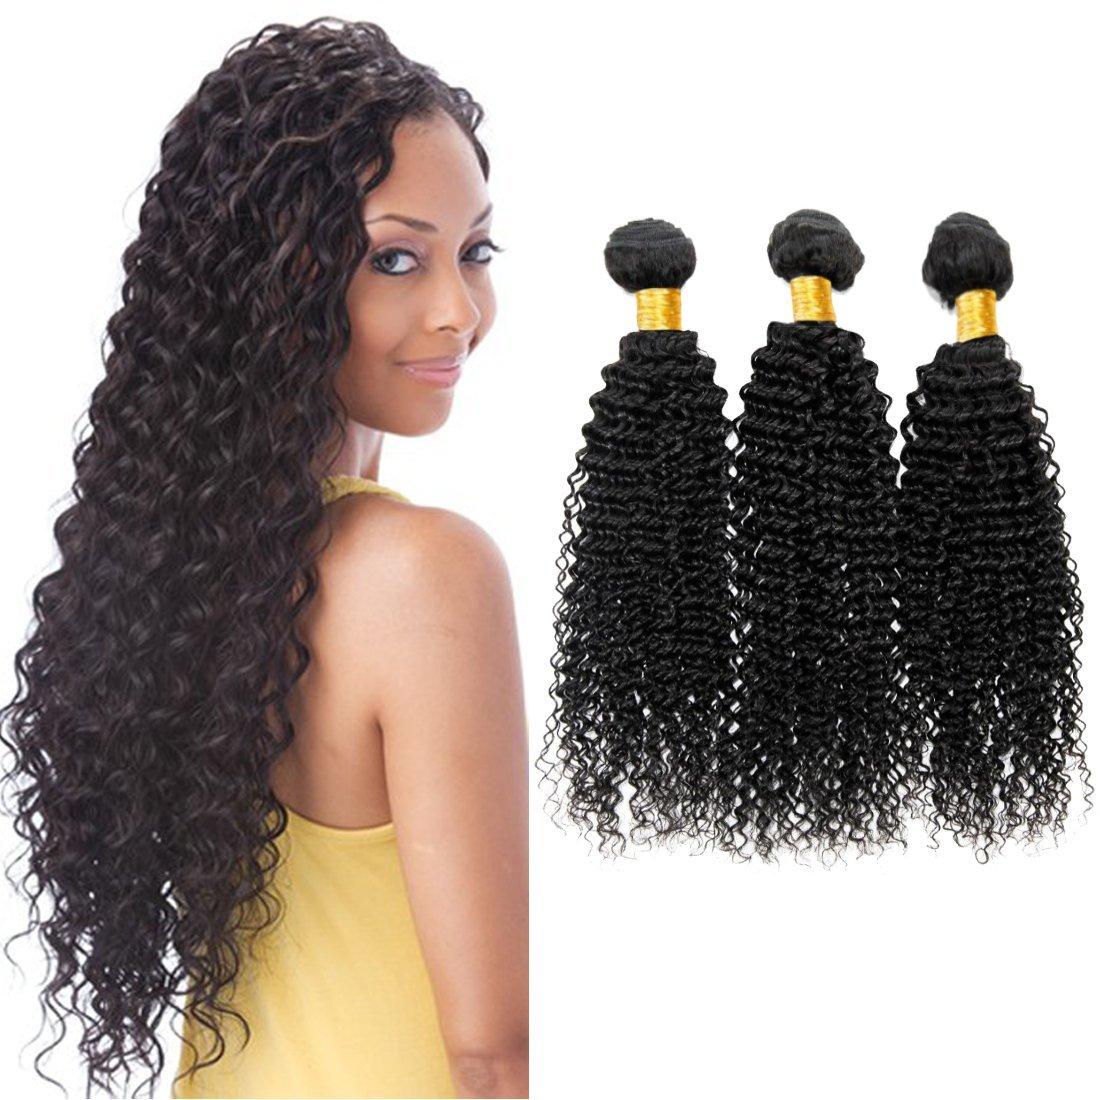 Peruvian Deep Wave Hair 3 Bundles for Black Women